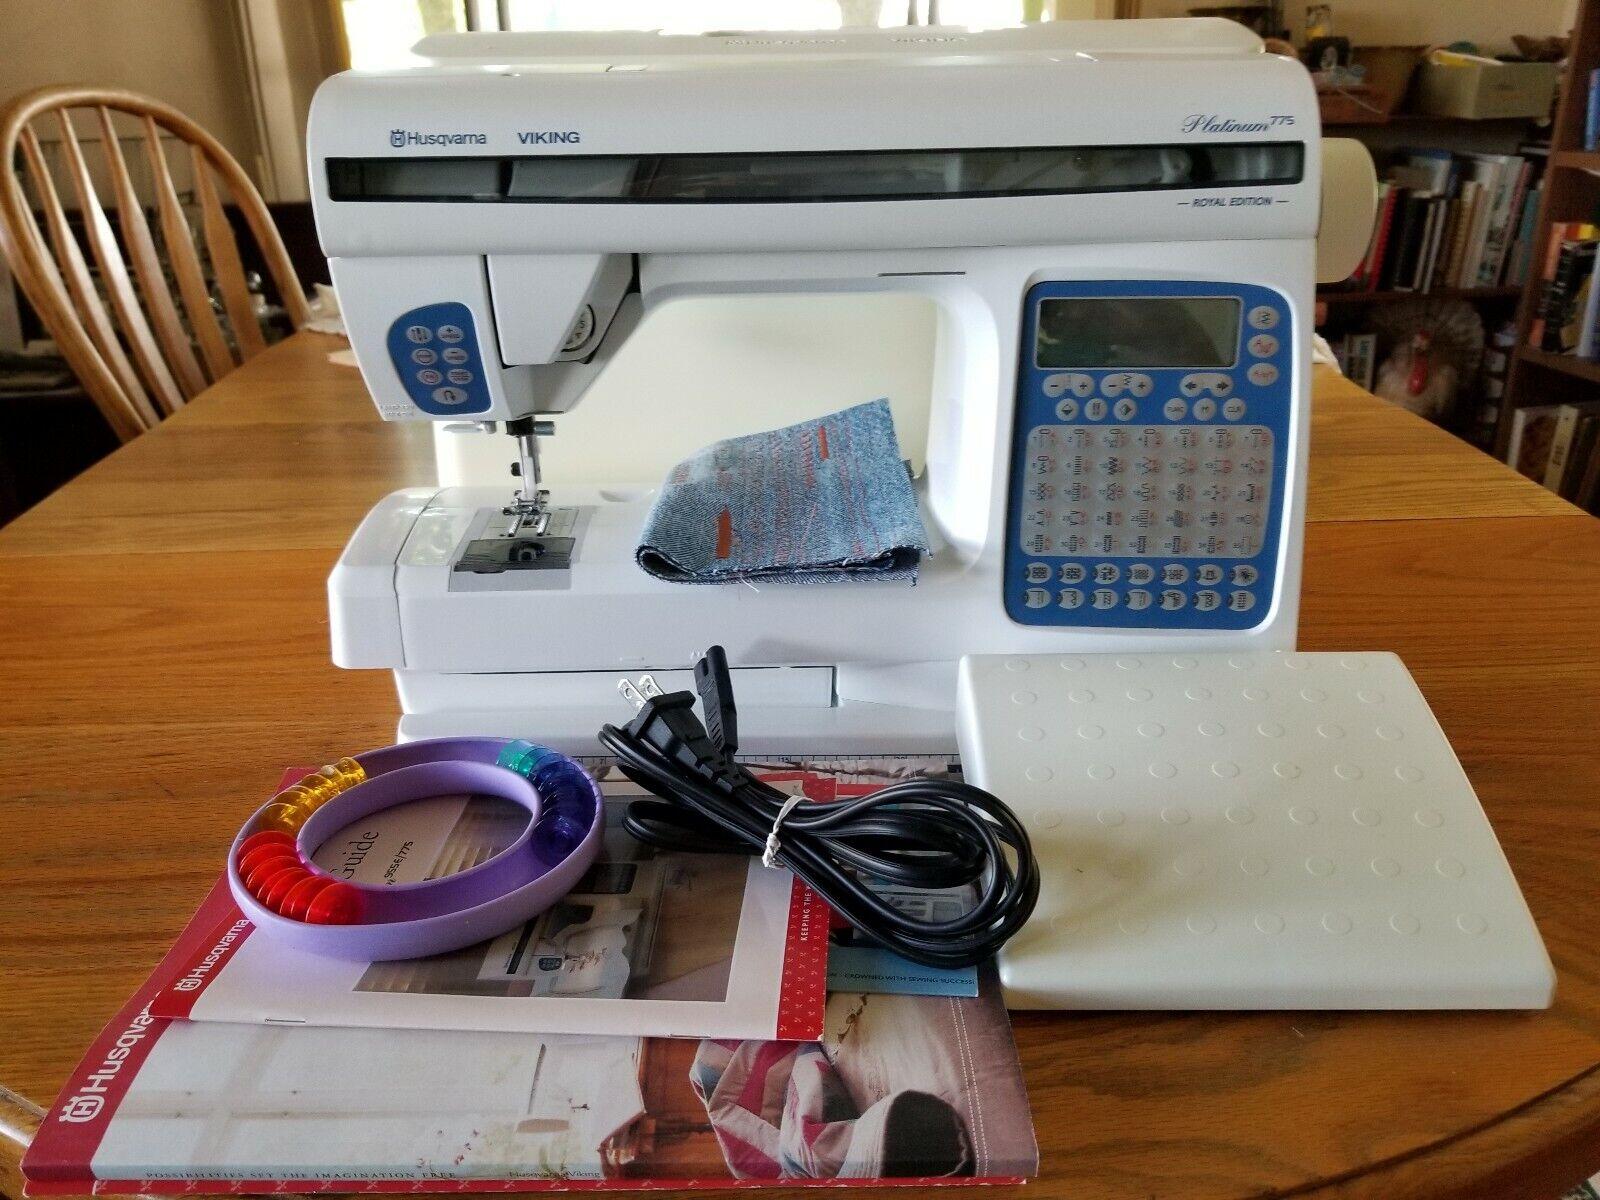 s l1600 - Husqvarna Sewing Machine Platinum 775 Royal Edition + Extra Bobbins